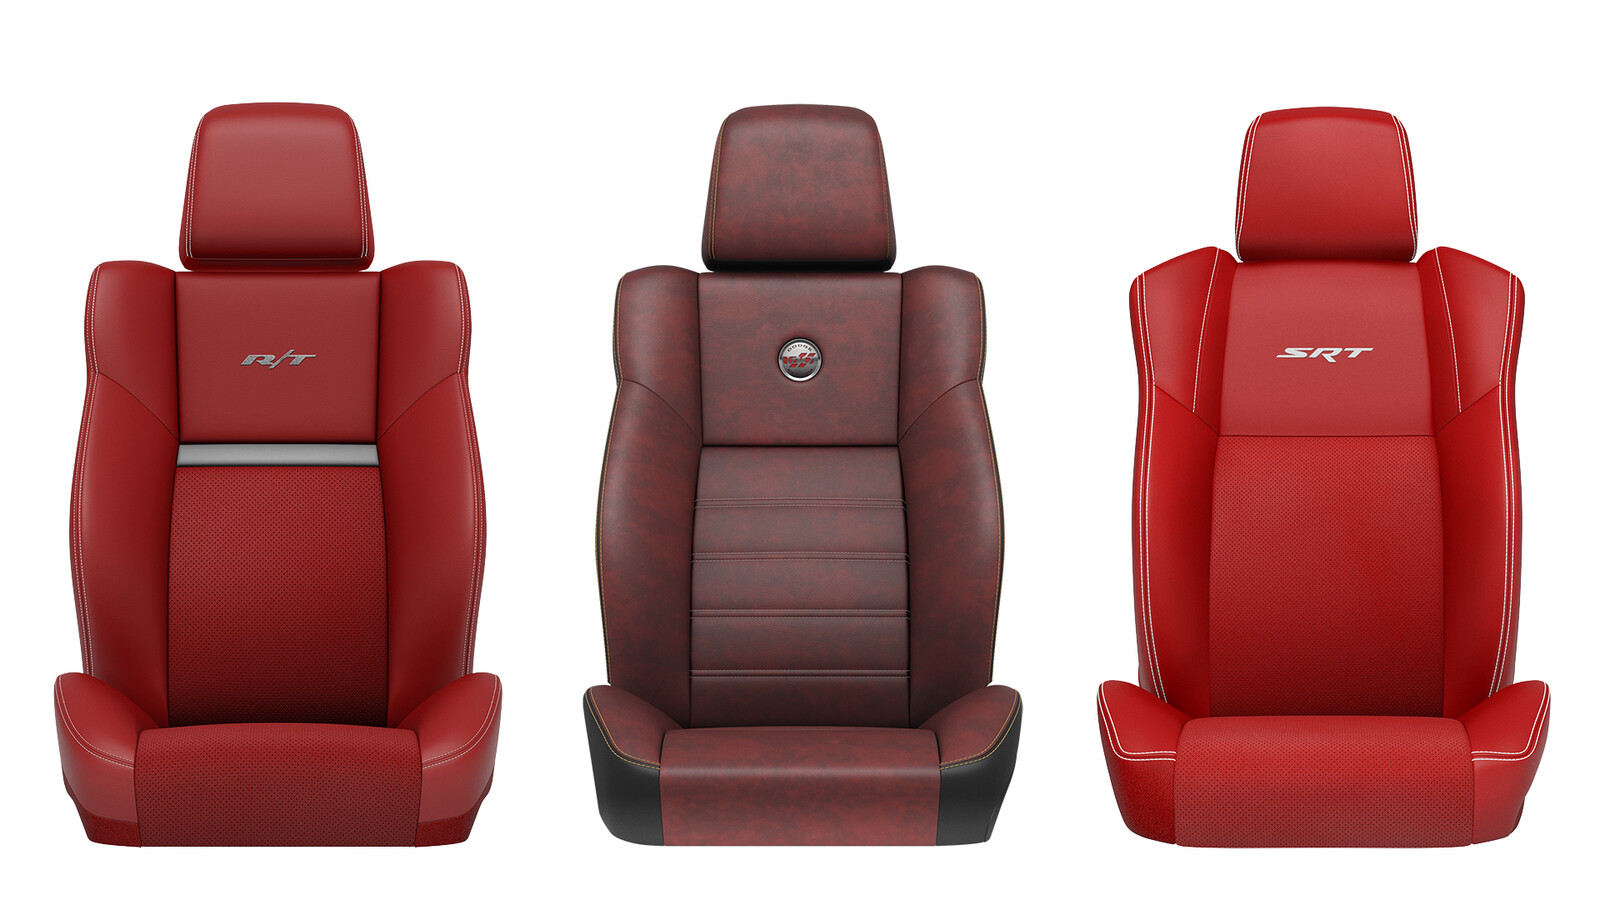 Dodge Challenger Seats Tasks: Materials, Lighting, & Retouching